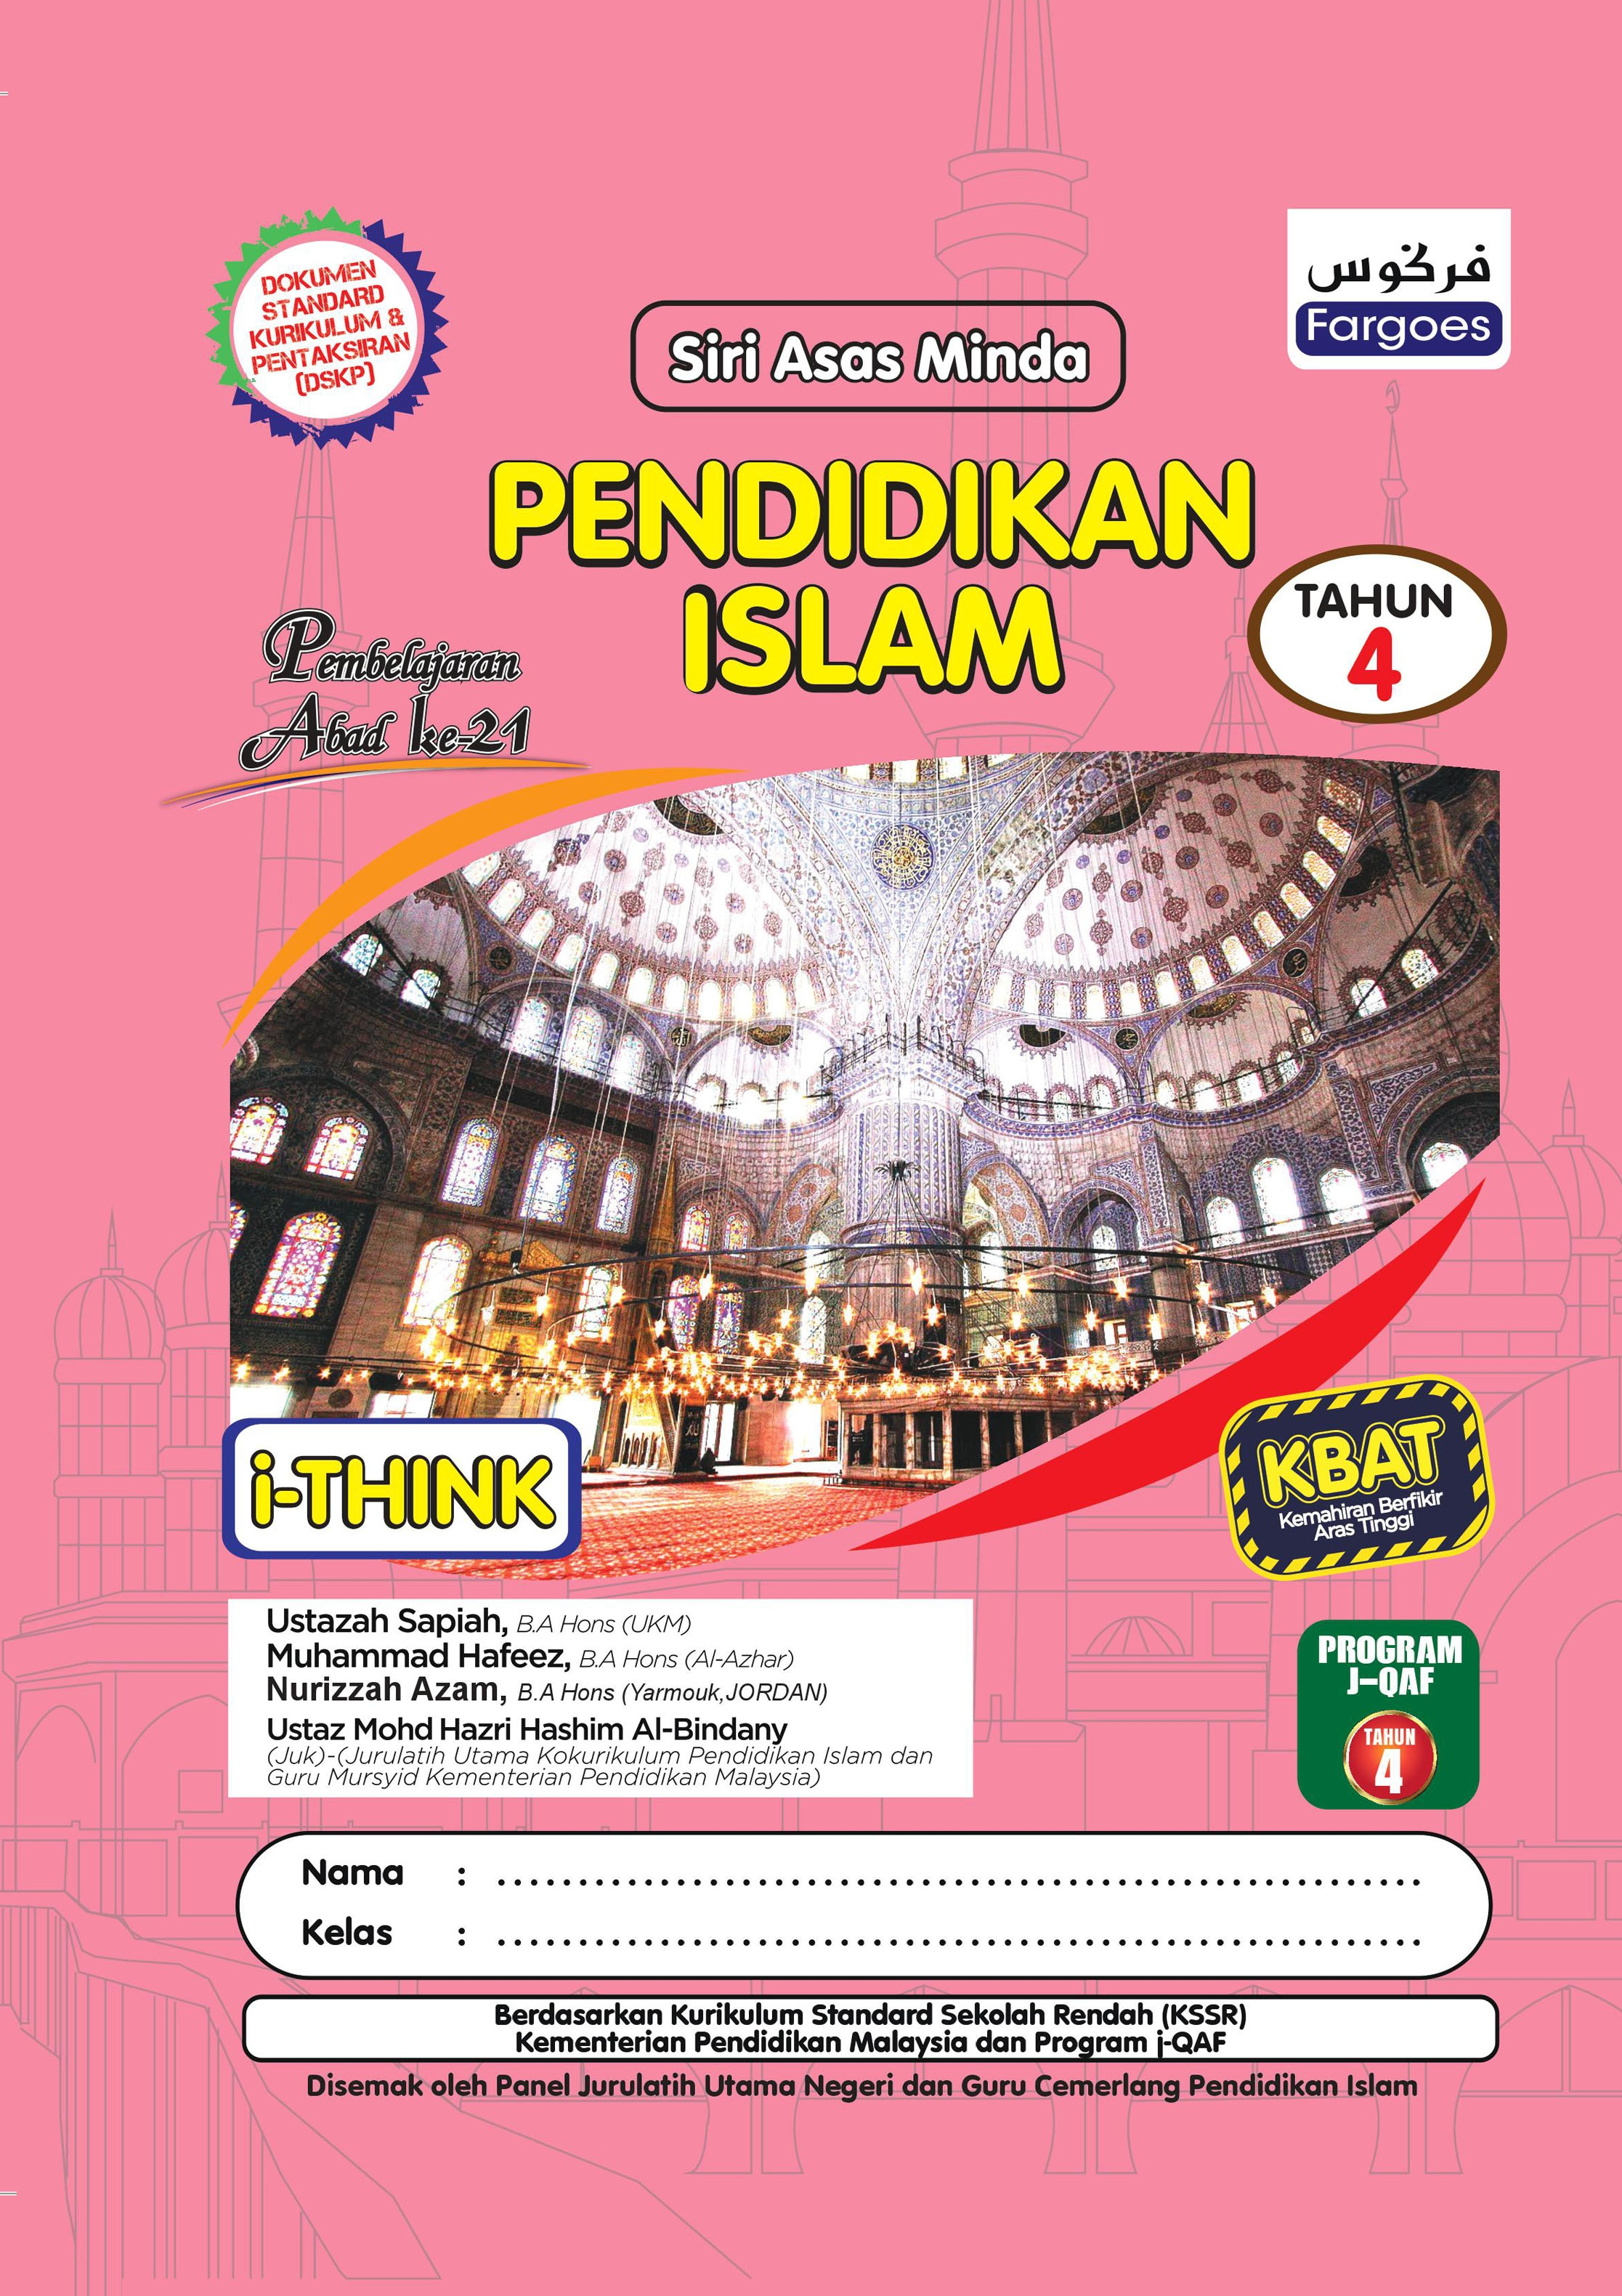 Download Dskp Pendidikan islam Tahun 4 Menarik Pendidikan islam Tahun 4 Fargoes Books Sdn Bhd Of Muat Turun Dskp Pendidikan islam Tahun 4 Yang Hebat Khas Untuk Ibubapa Cetakkan